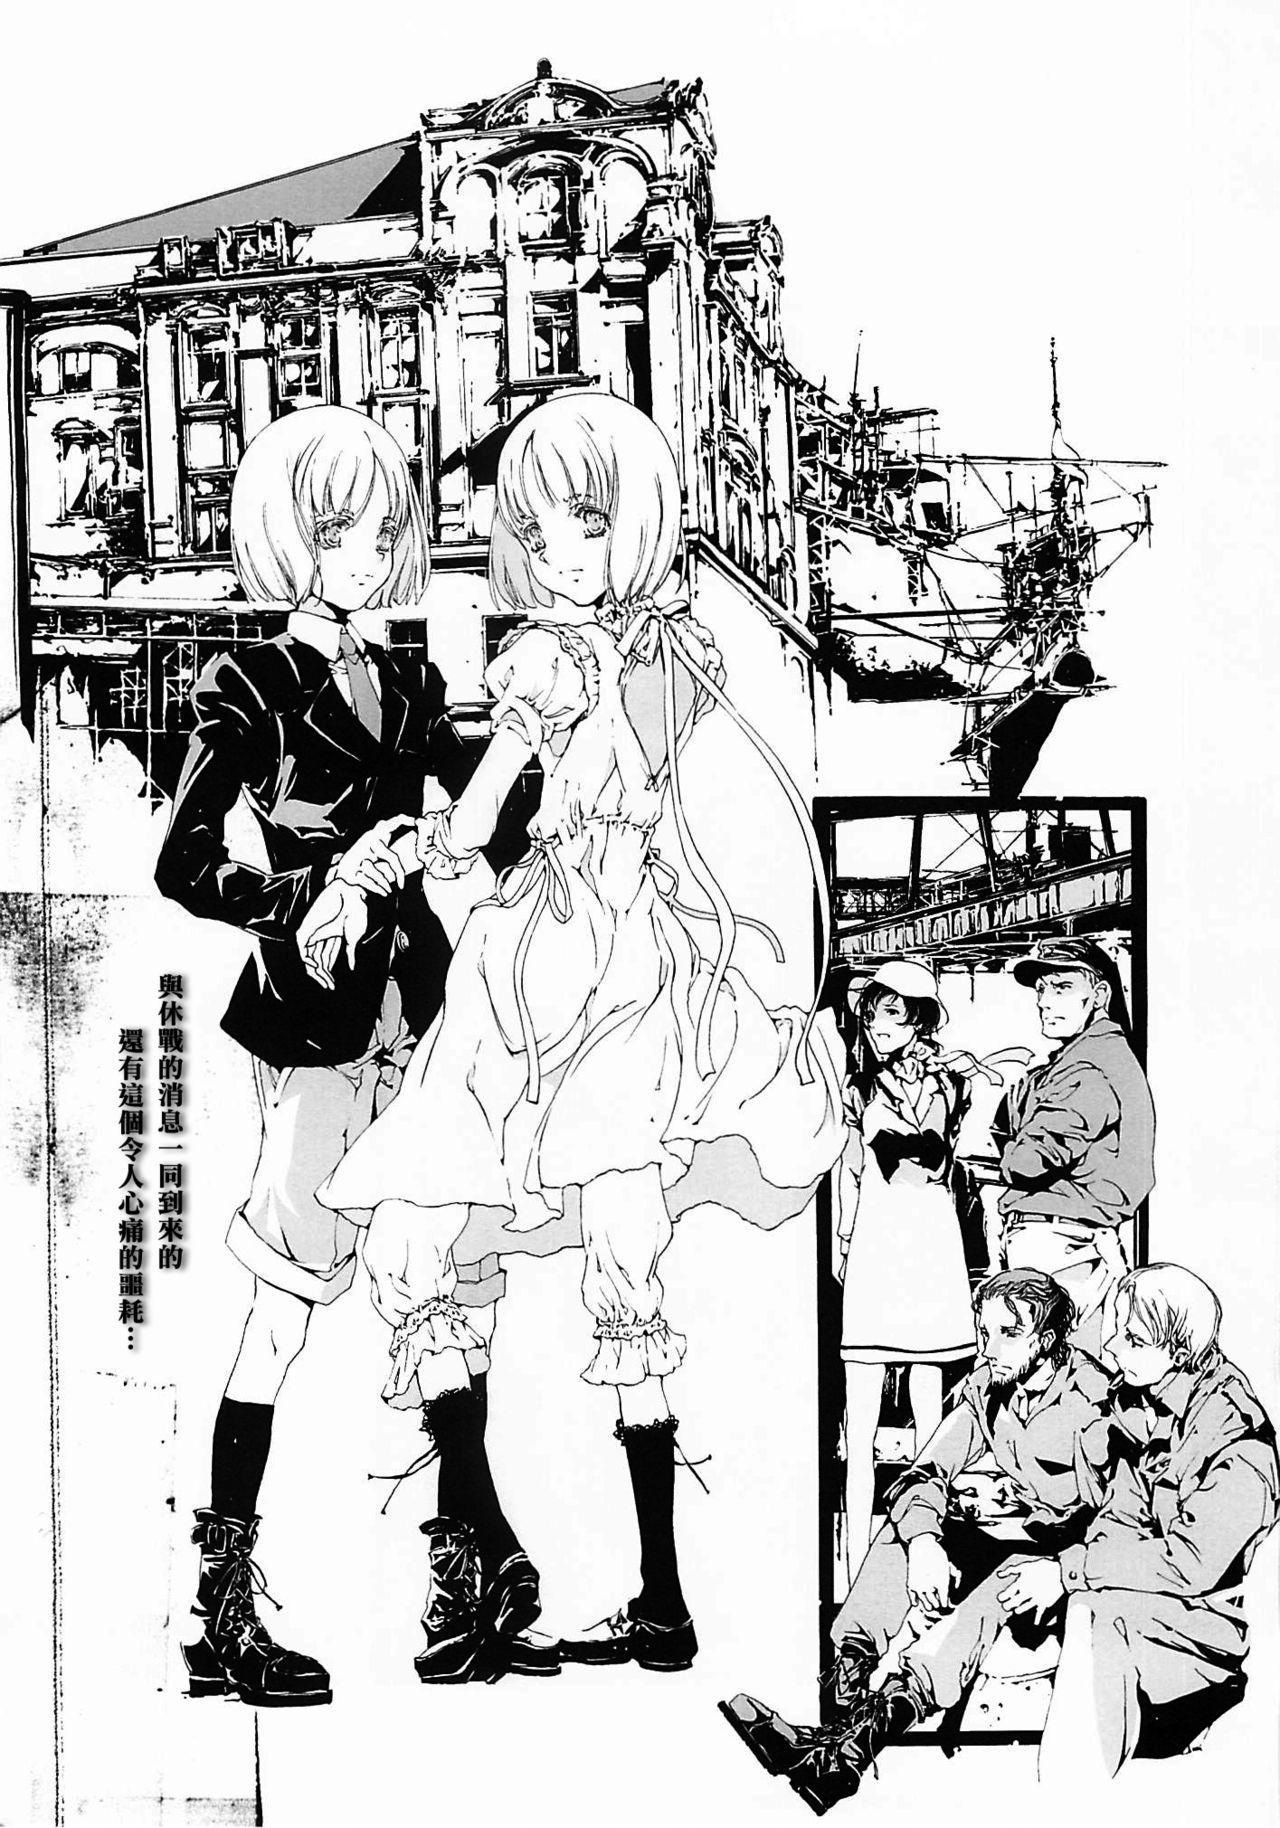 (CR37) [70 Nenshiki Yuukyuu Kikan (Endou Okito)] ORGAN-Tino  01-02[Chinese] [拾荒者汉化组] [Incomplete] 72